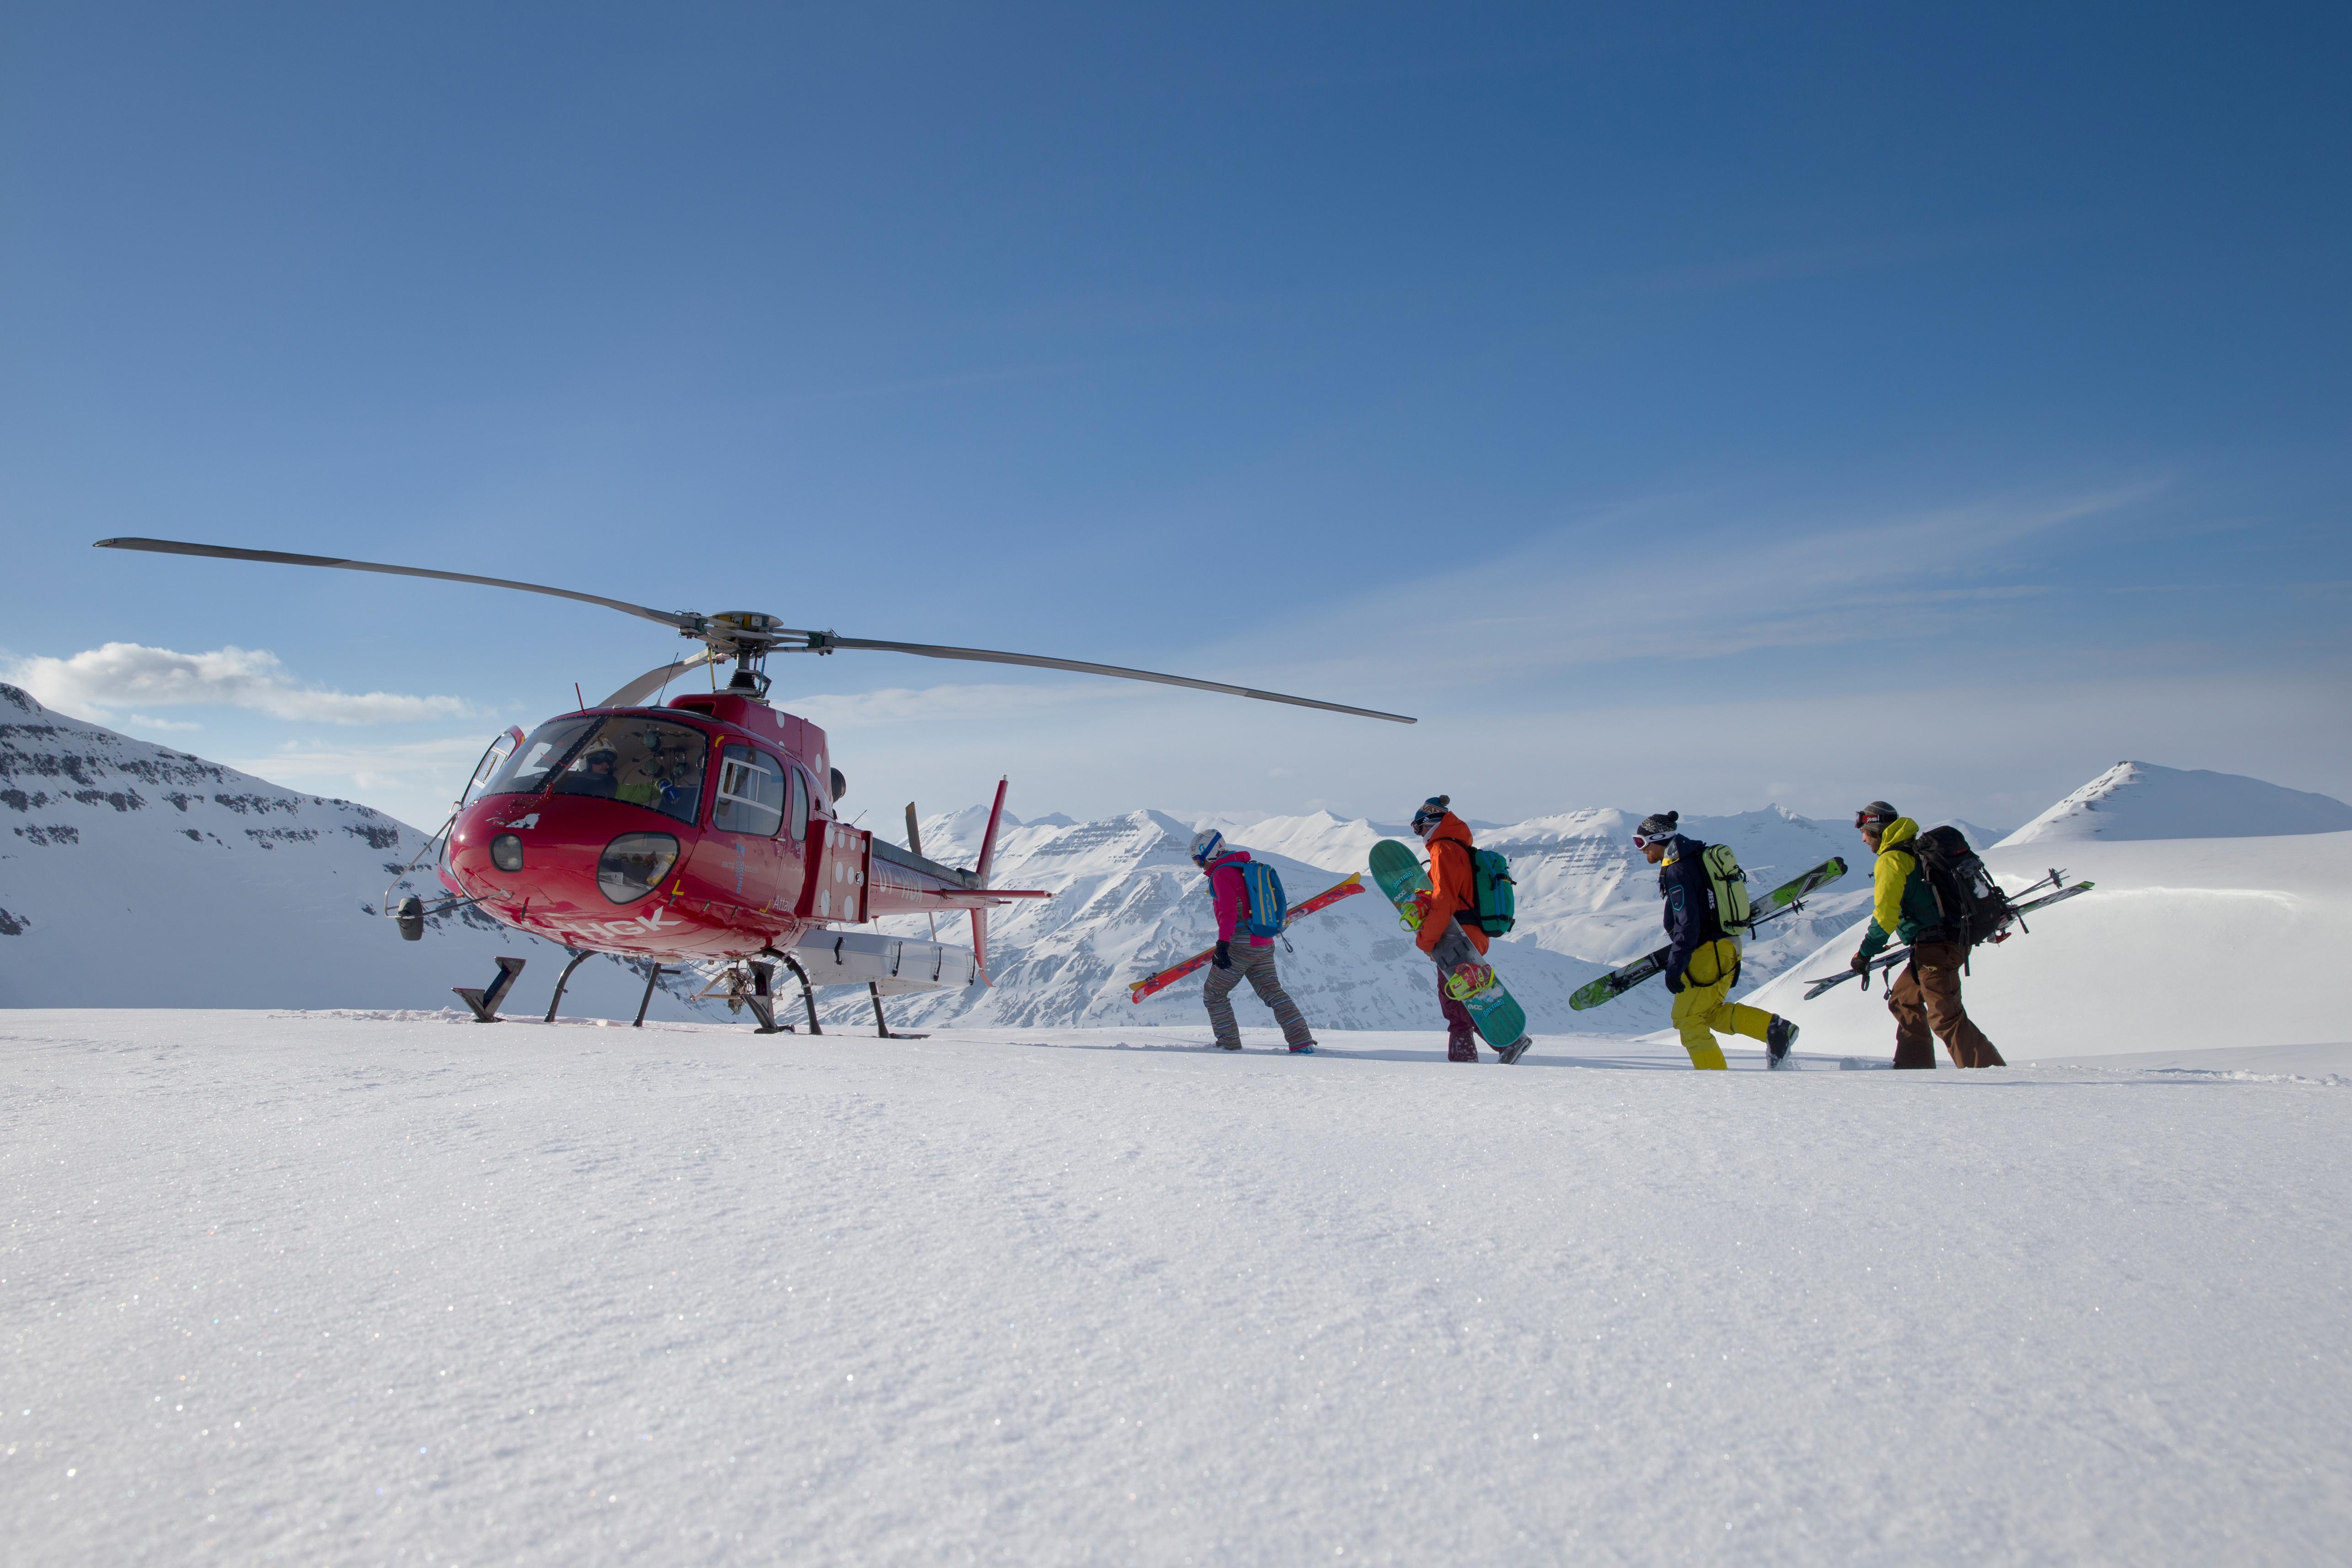 Skiërs stappen in helikopter